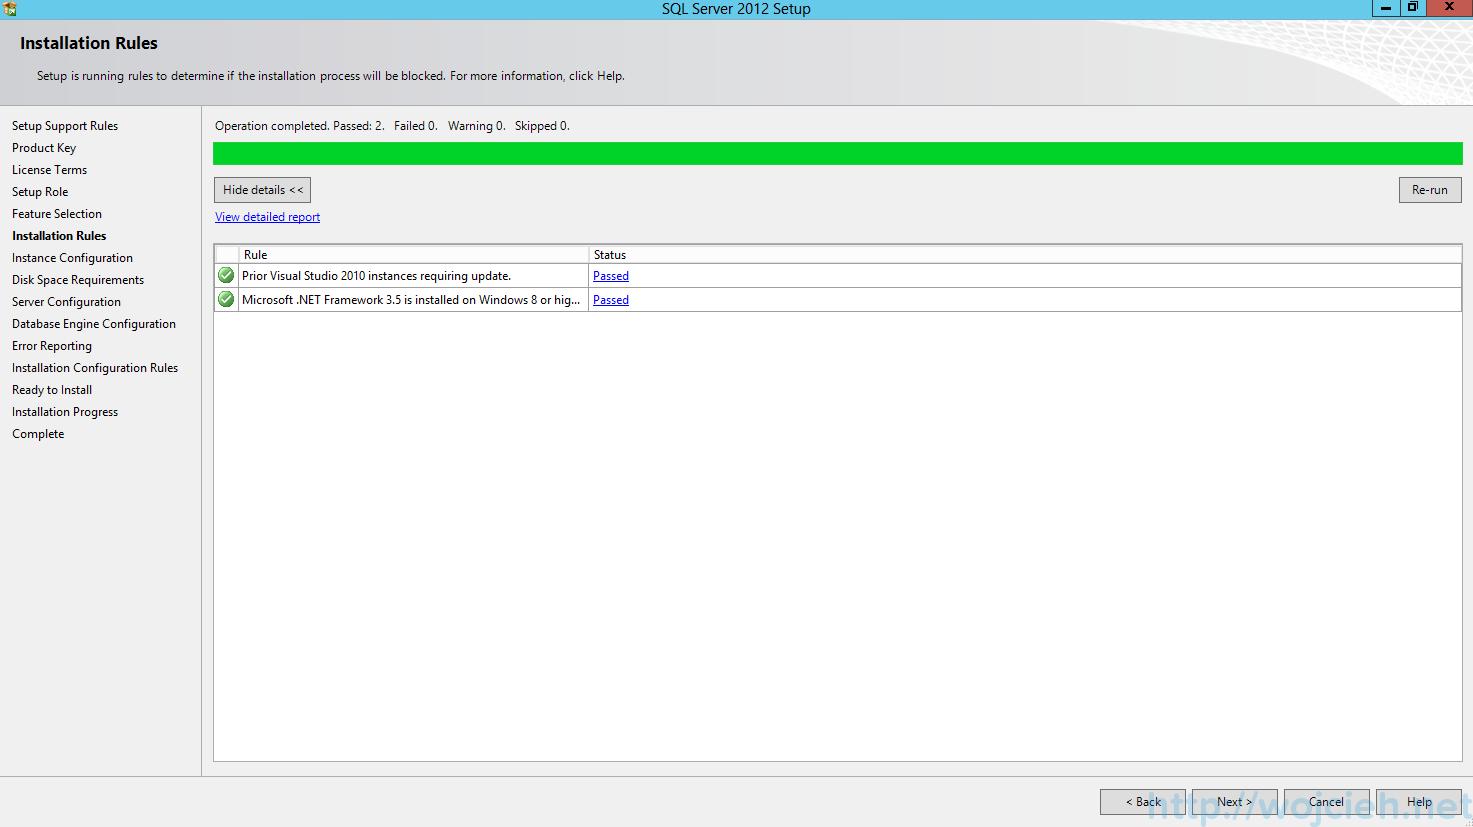 SQL Server 2012 SP1 - Installation Rules